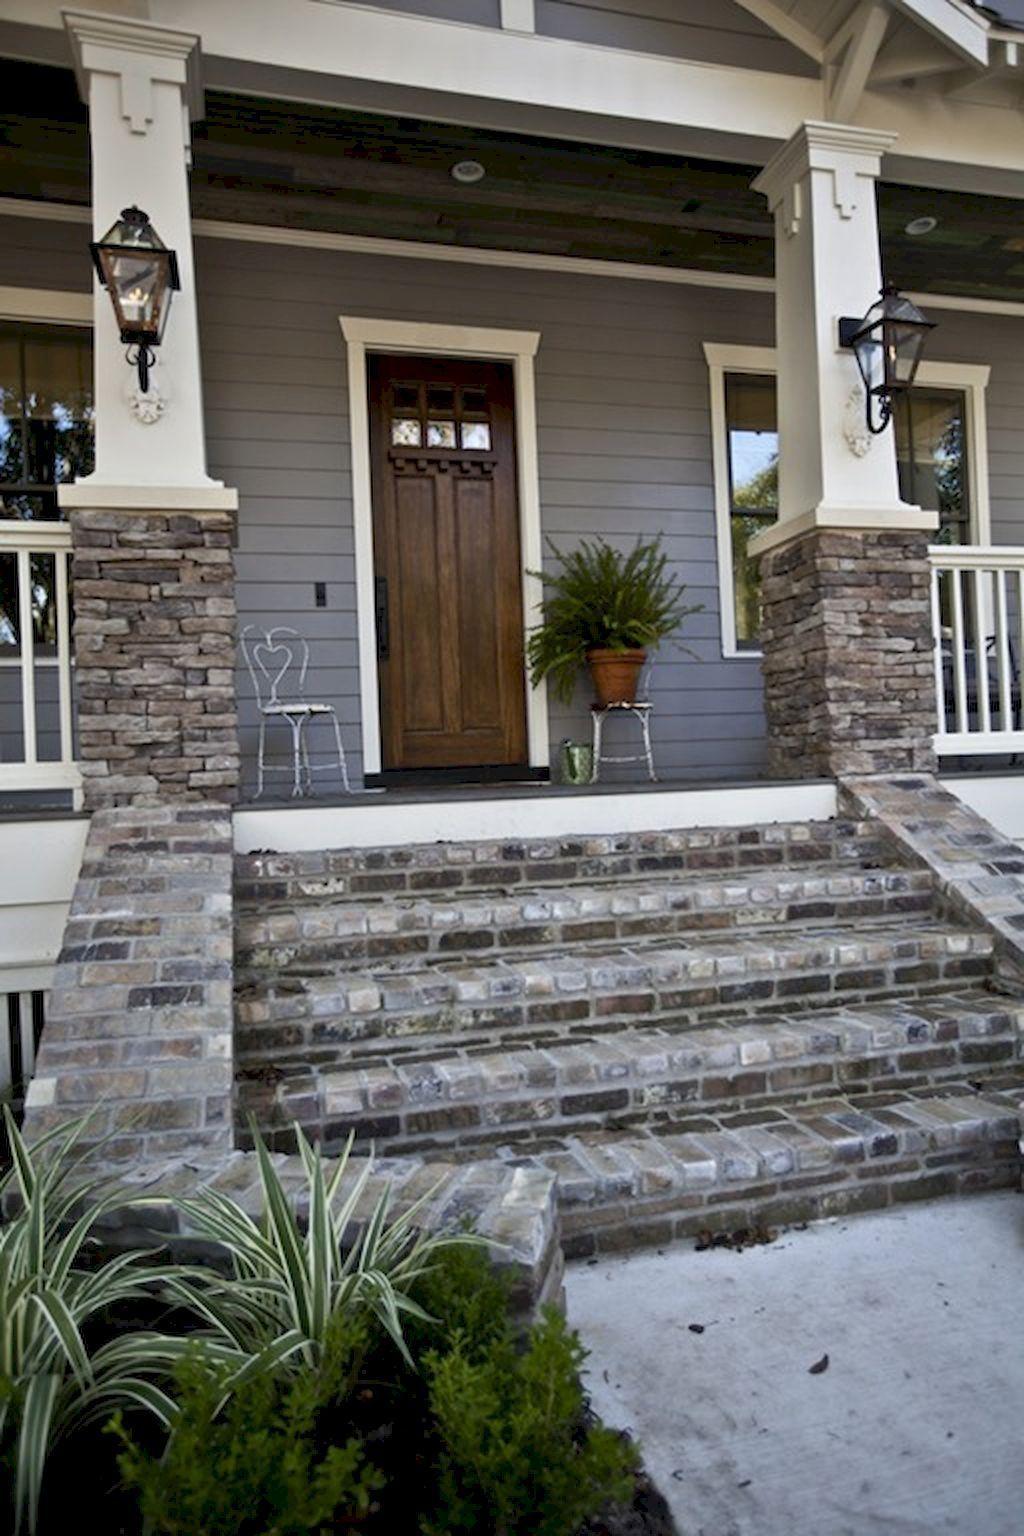 99 elegant farmhouse front porch decor ideas | pinterest | farmhouse